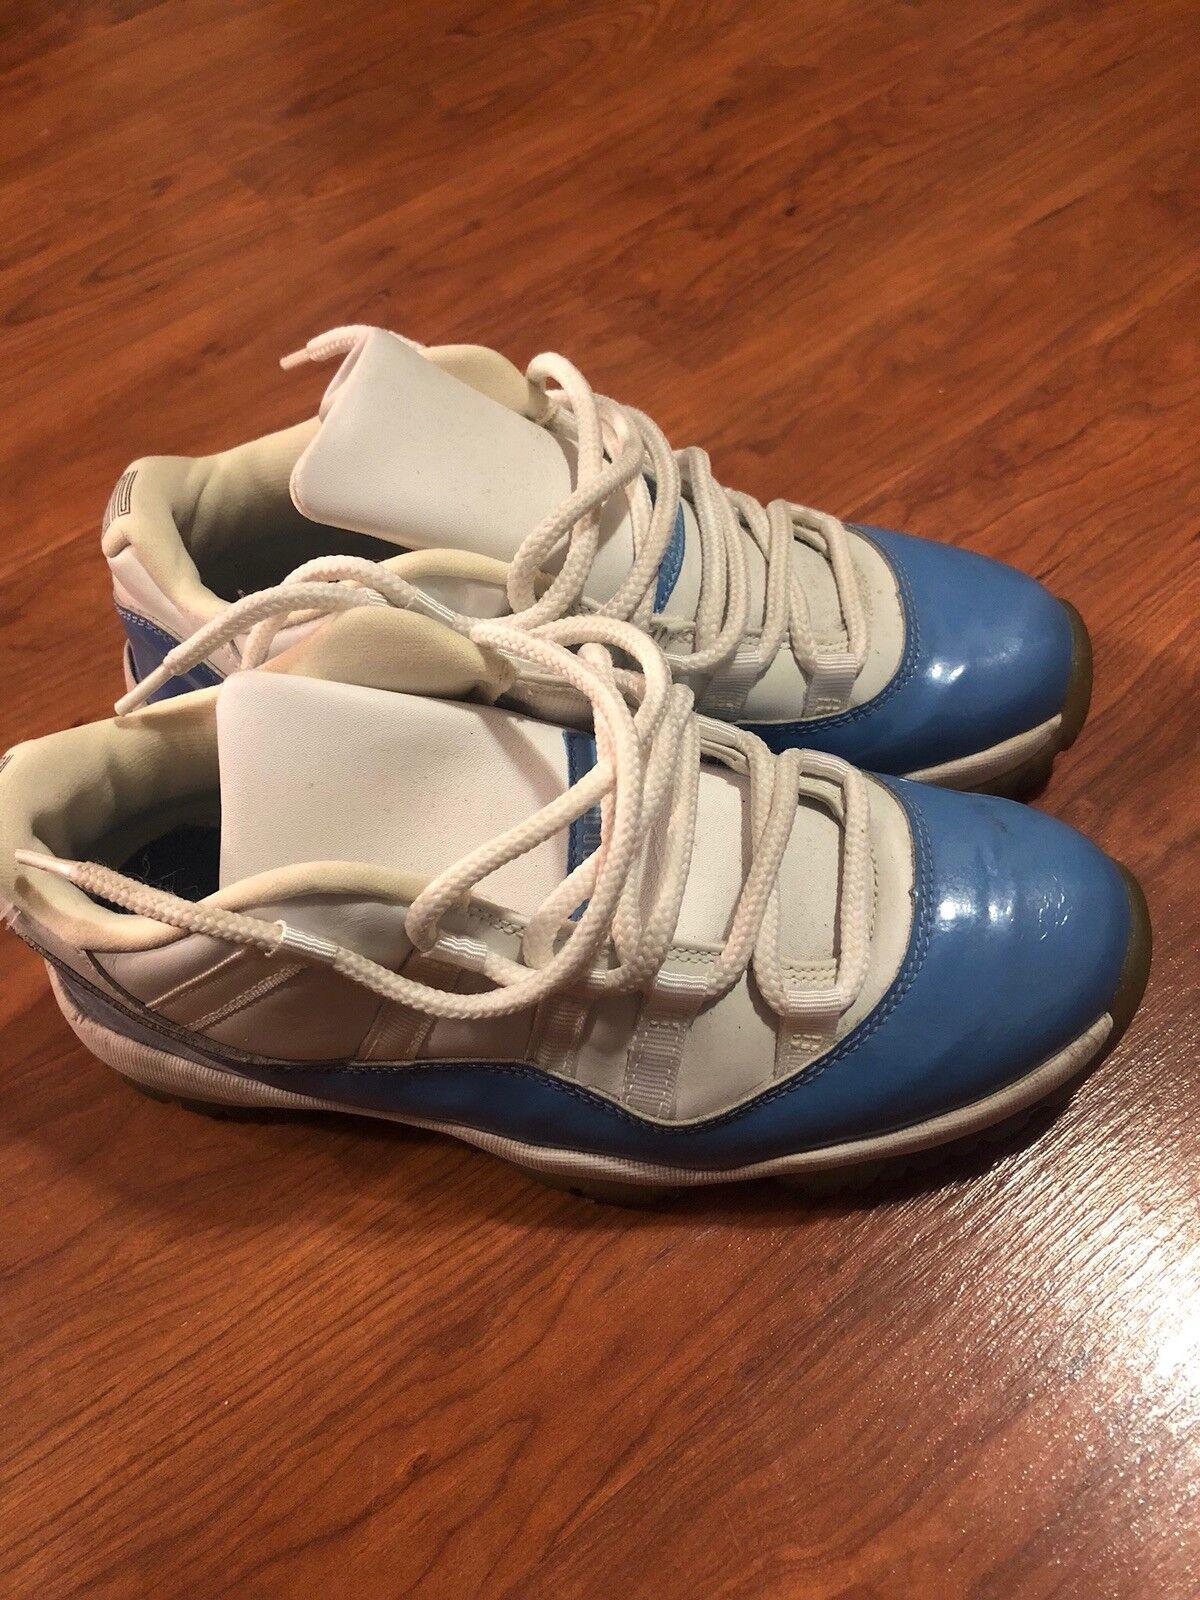 Air Jordan 11 Retro Low (Carolina bluee)